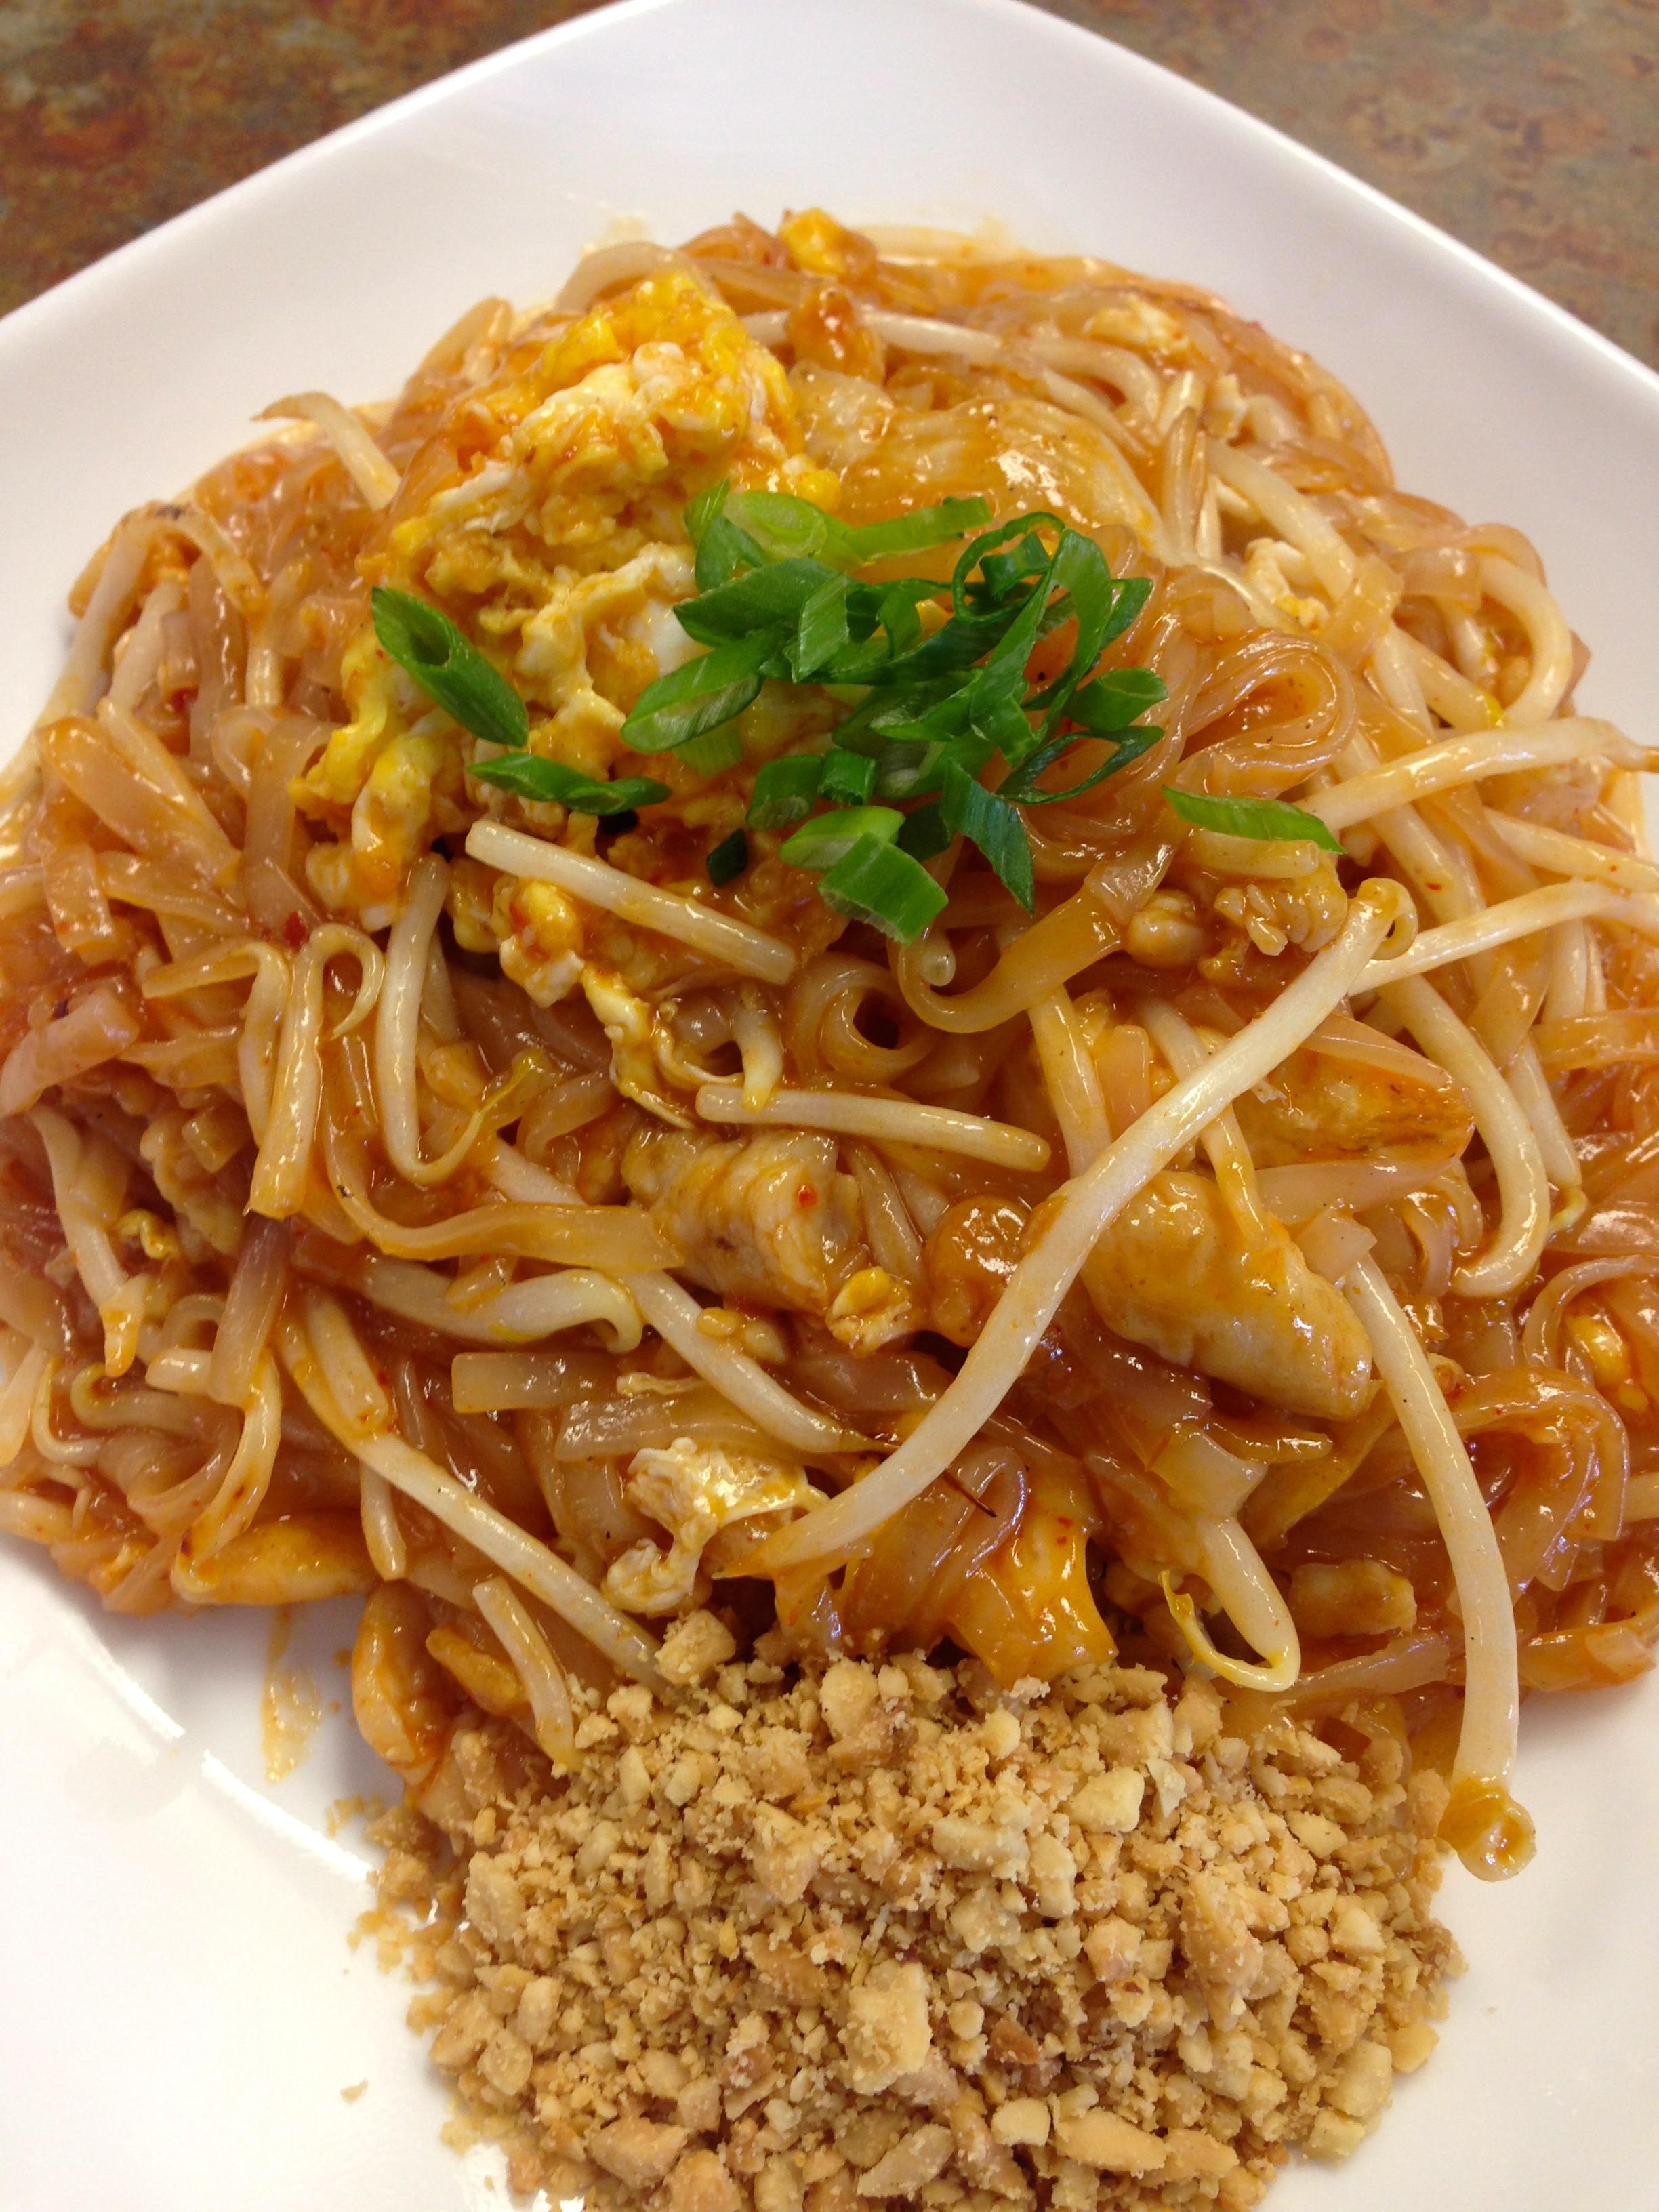 #35 PAD THAI